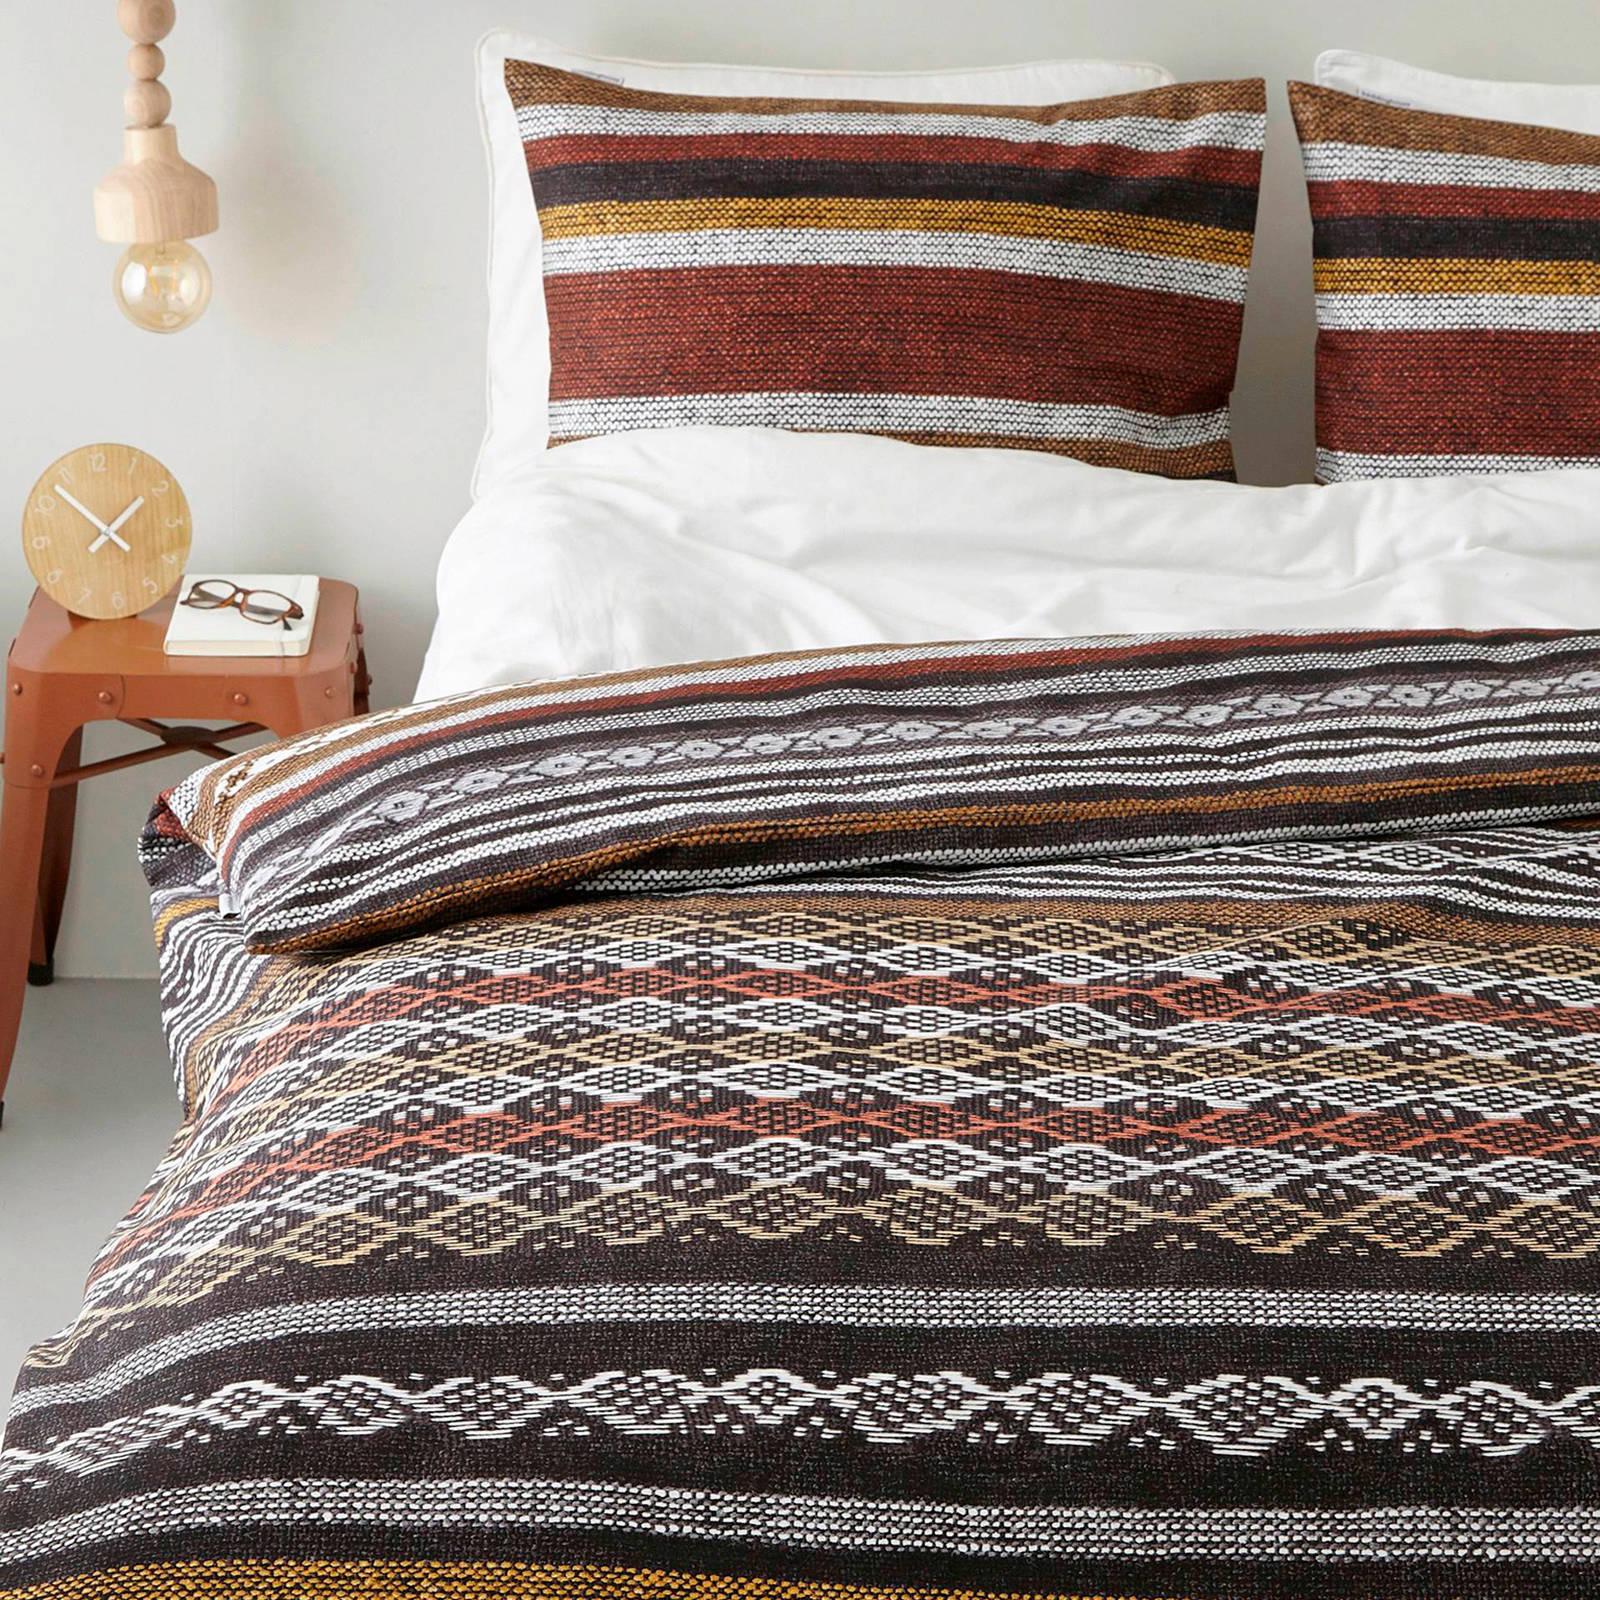 beddinghouse katoenen dekbedovertrek lits jumeaux bruin